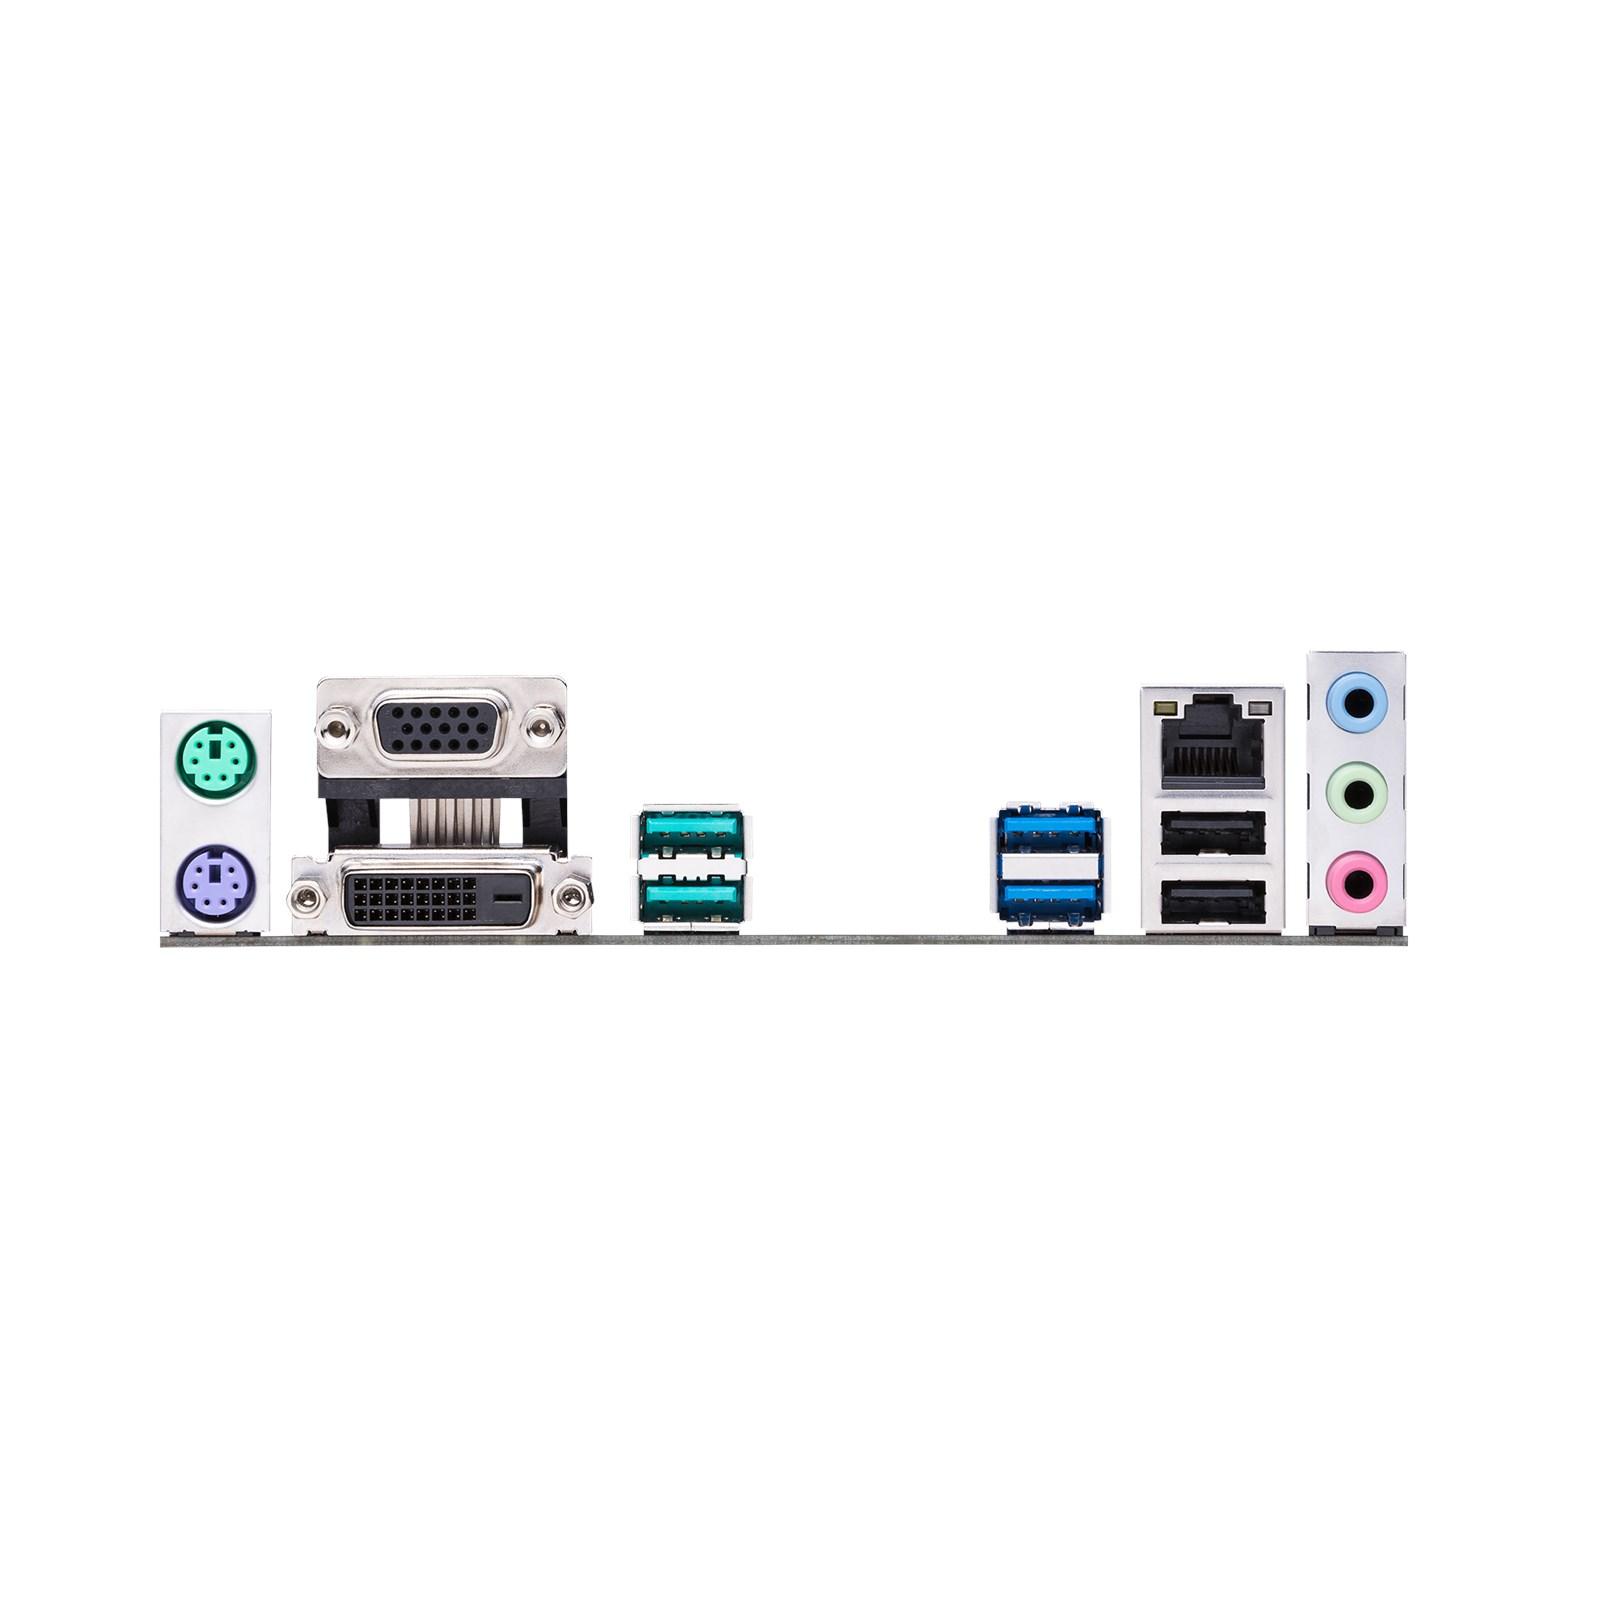 ASUS PRIME B360M-K Intel Socket 1151 Motherboard